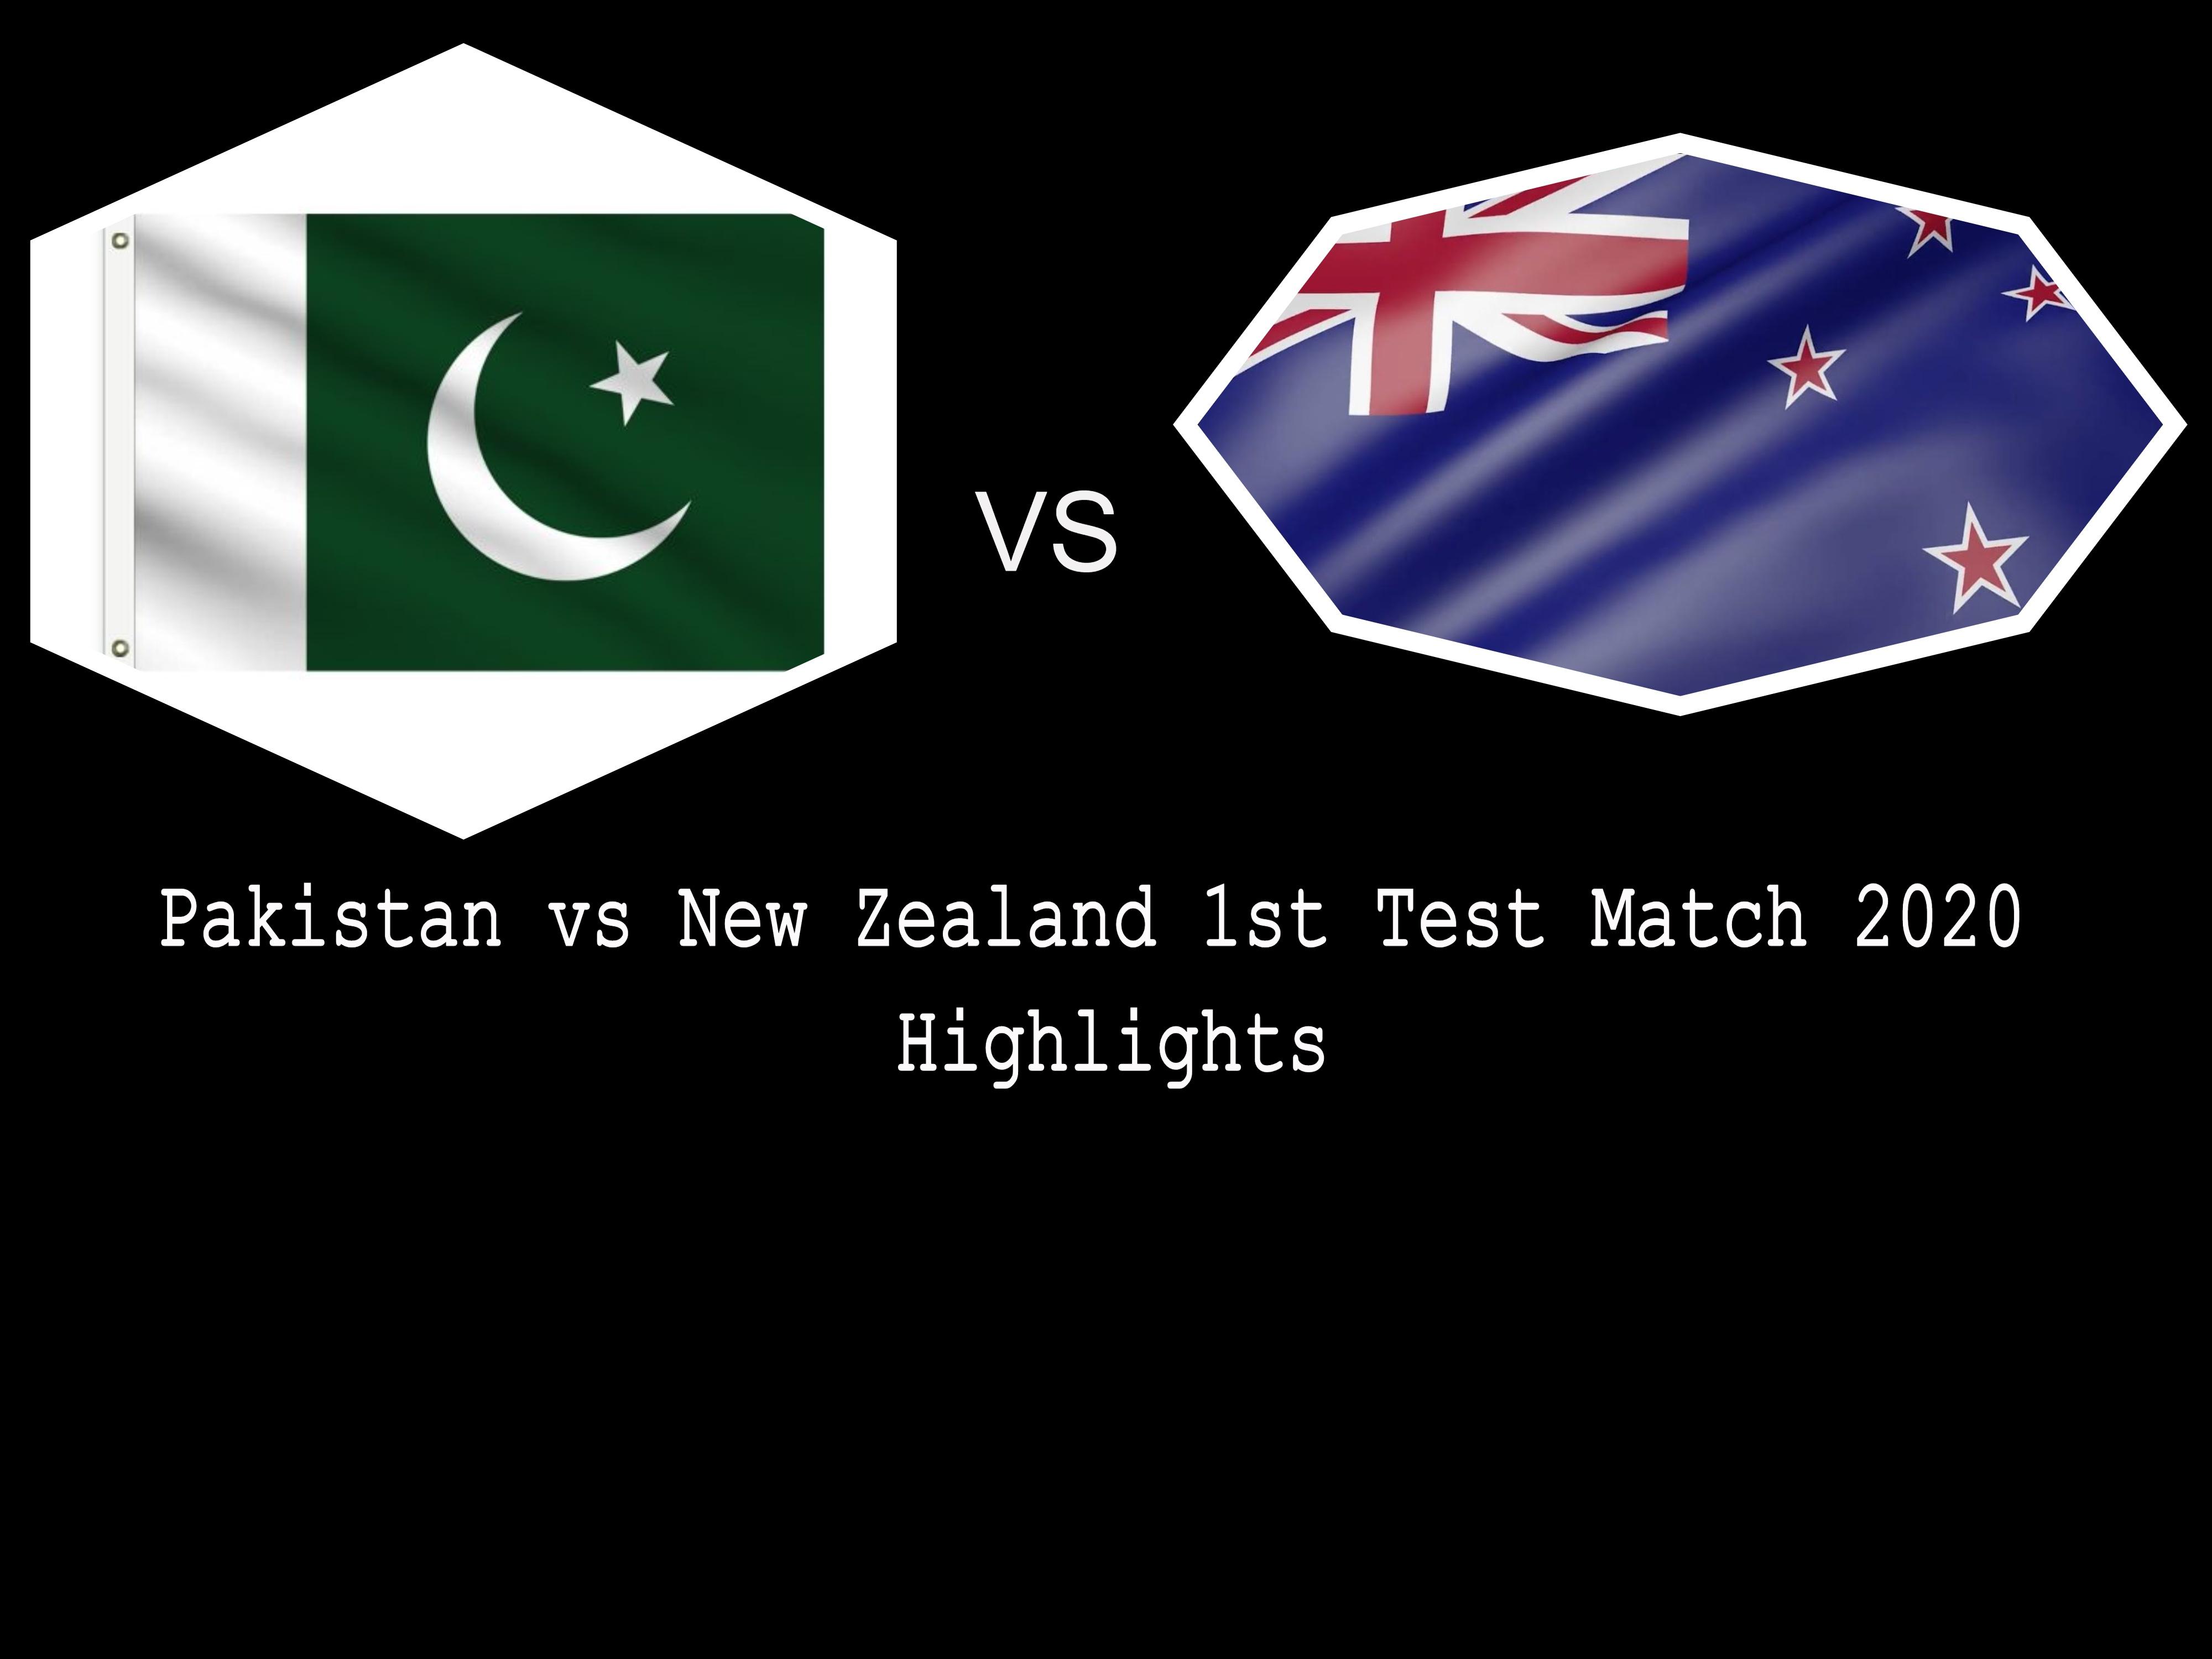 Pakistan vs New Zealand 1st Test Match 2020 Highlights